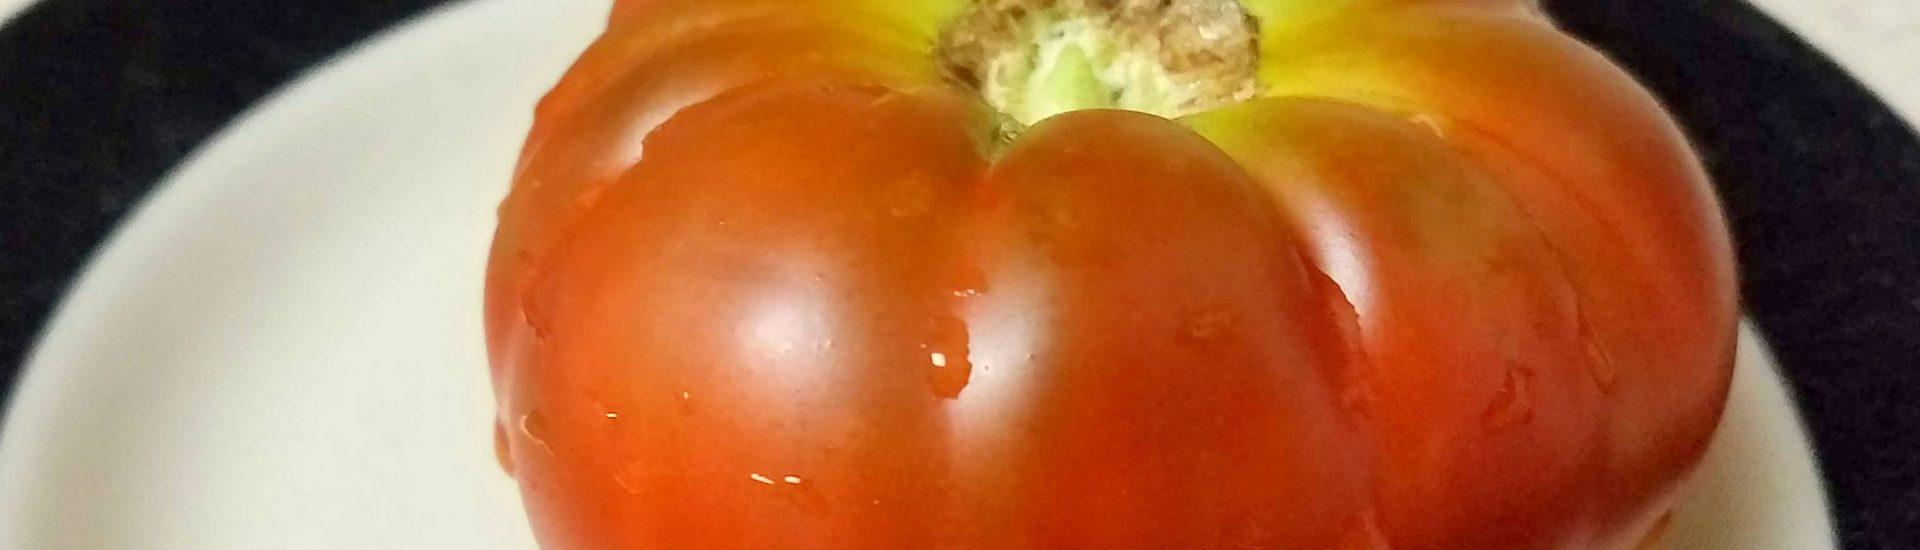 Tasmanian Chocolate Tomato